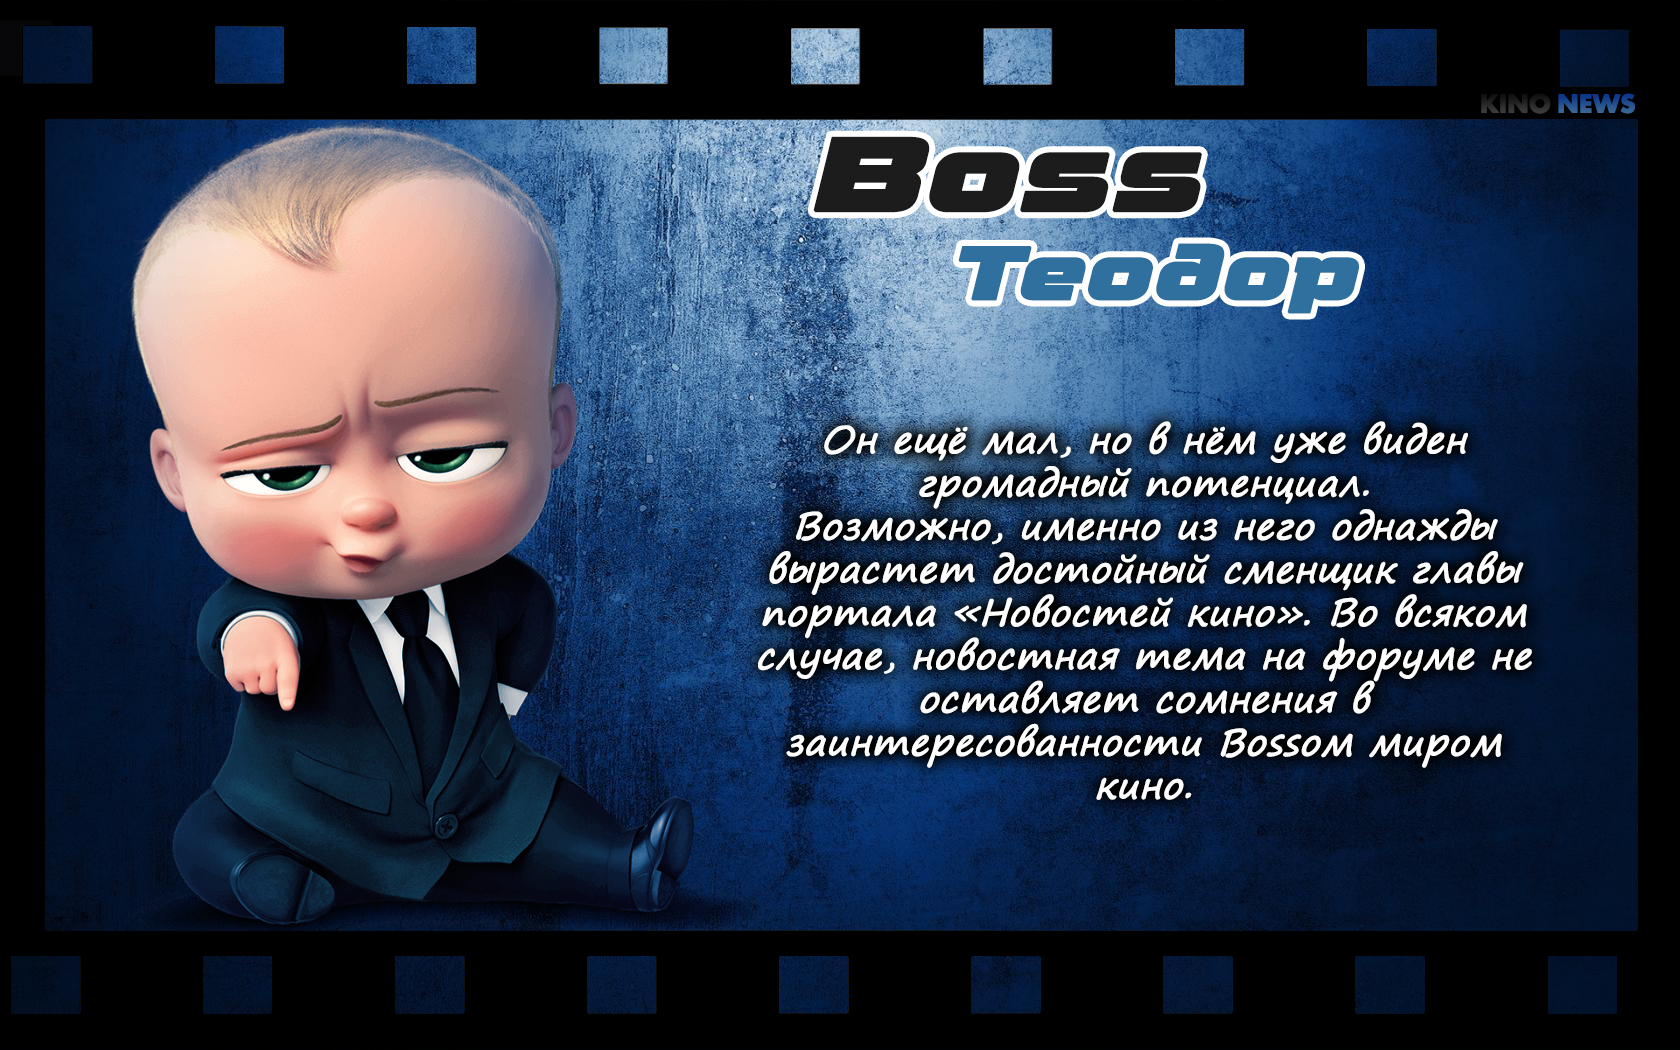 https://www.kinonews.ru/insimgs/2017/persimg/persimg77944_31.jpg